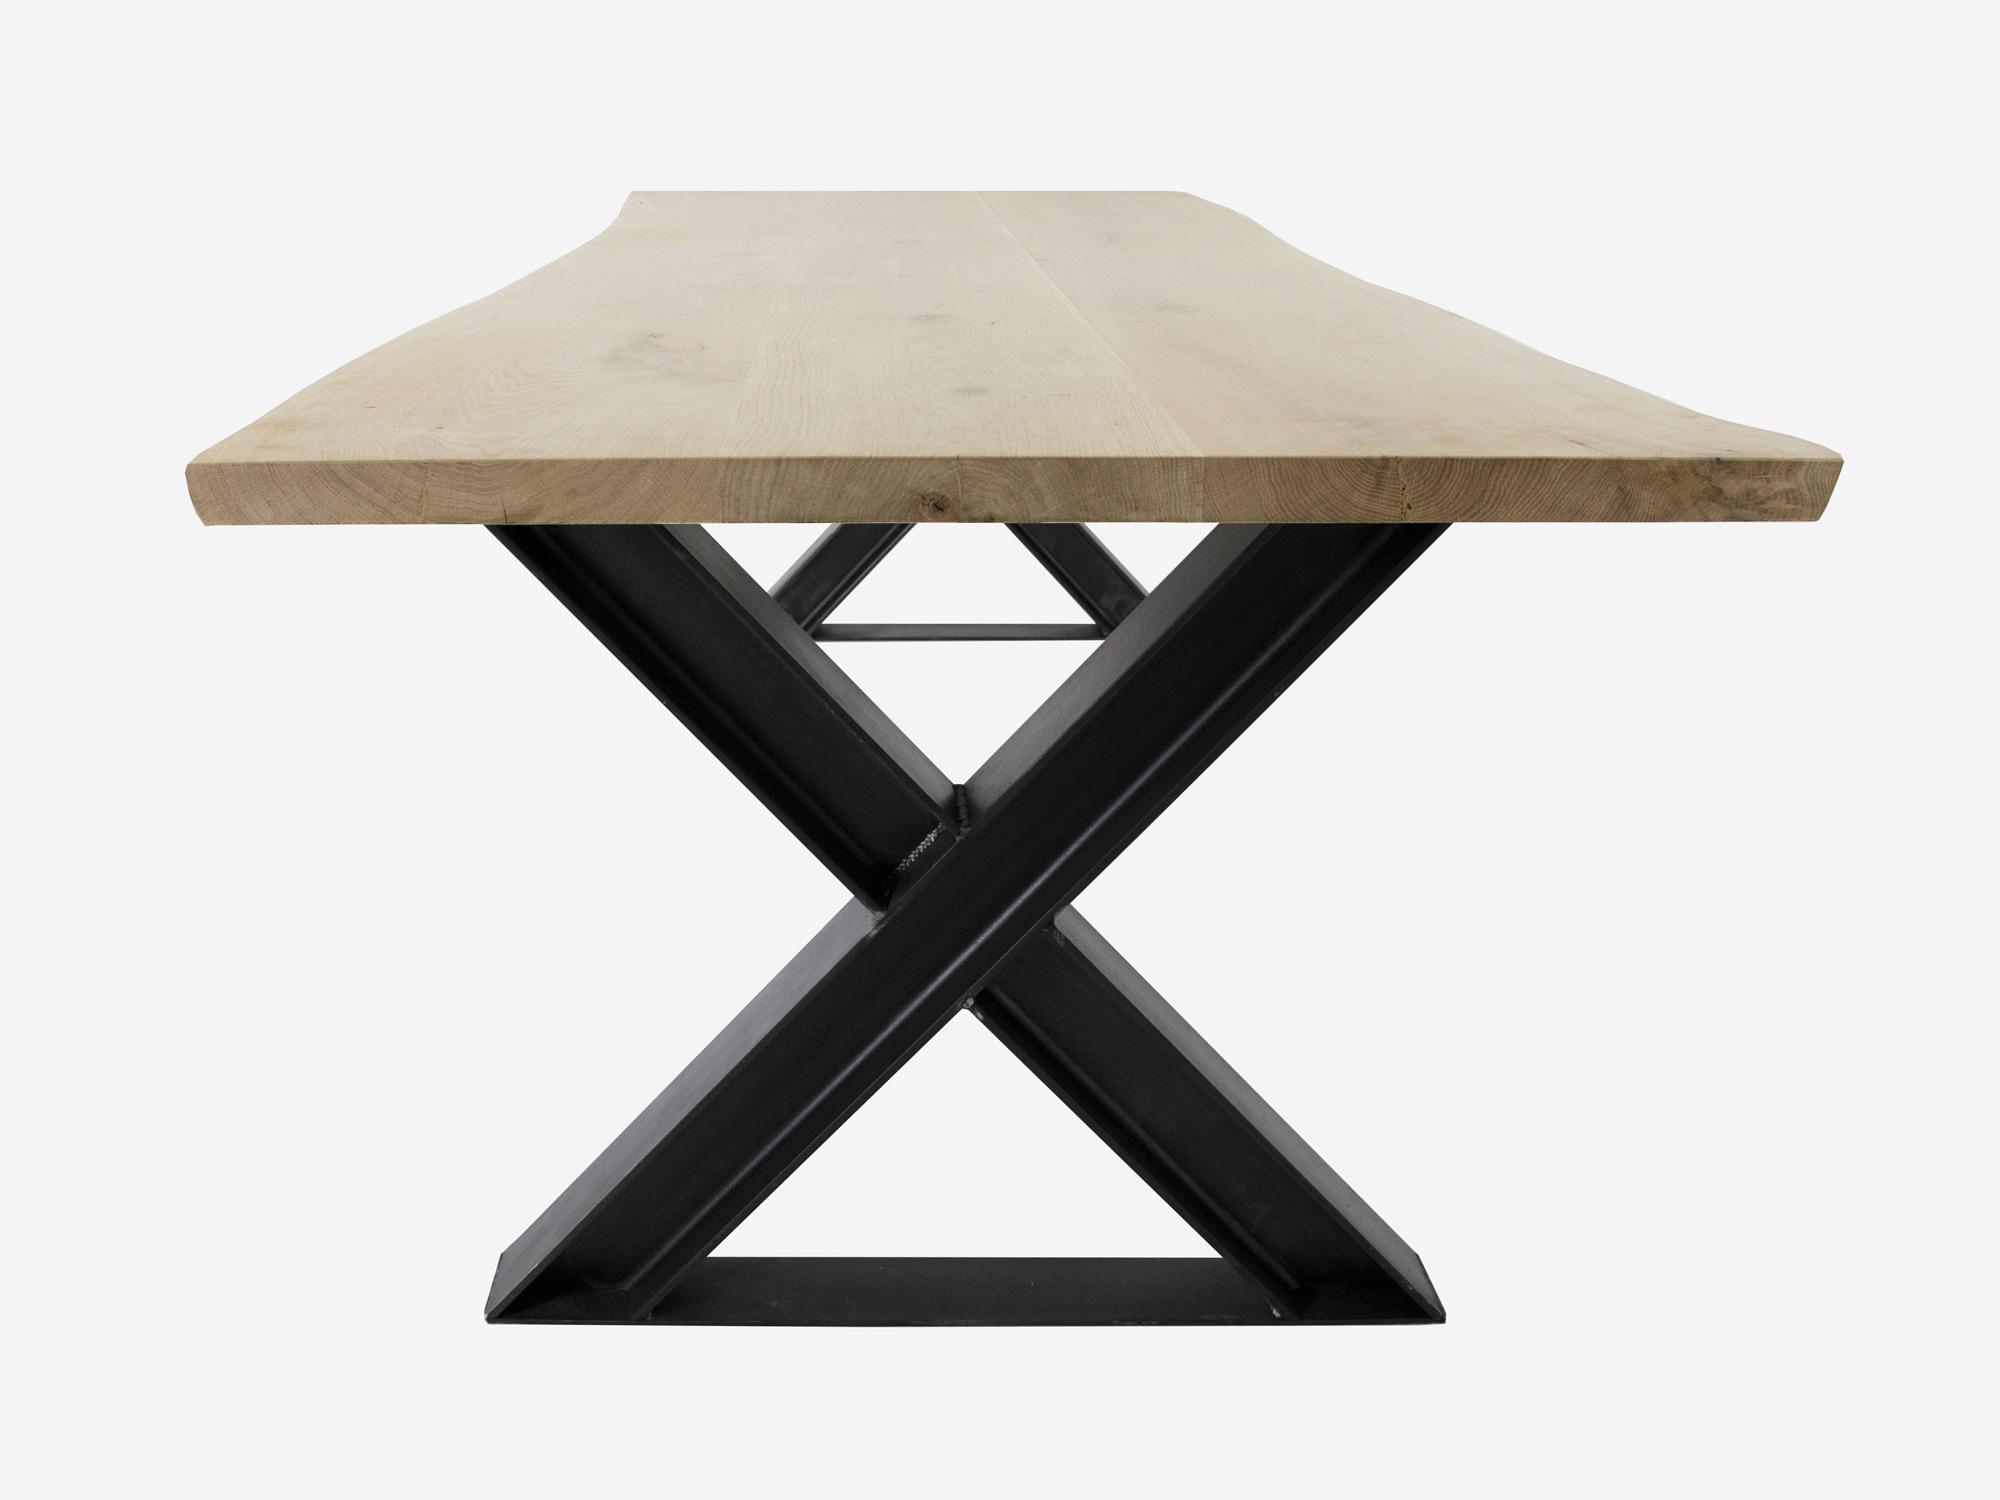 Stalen onderstel tafel laten maken tafel teun steigerhout en